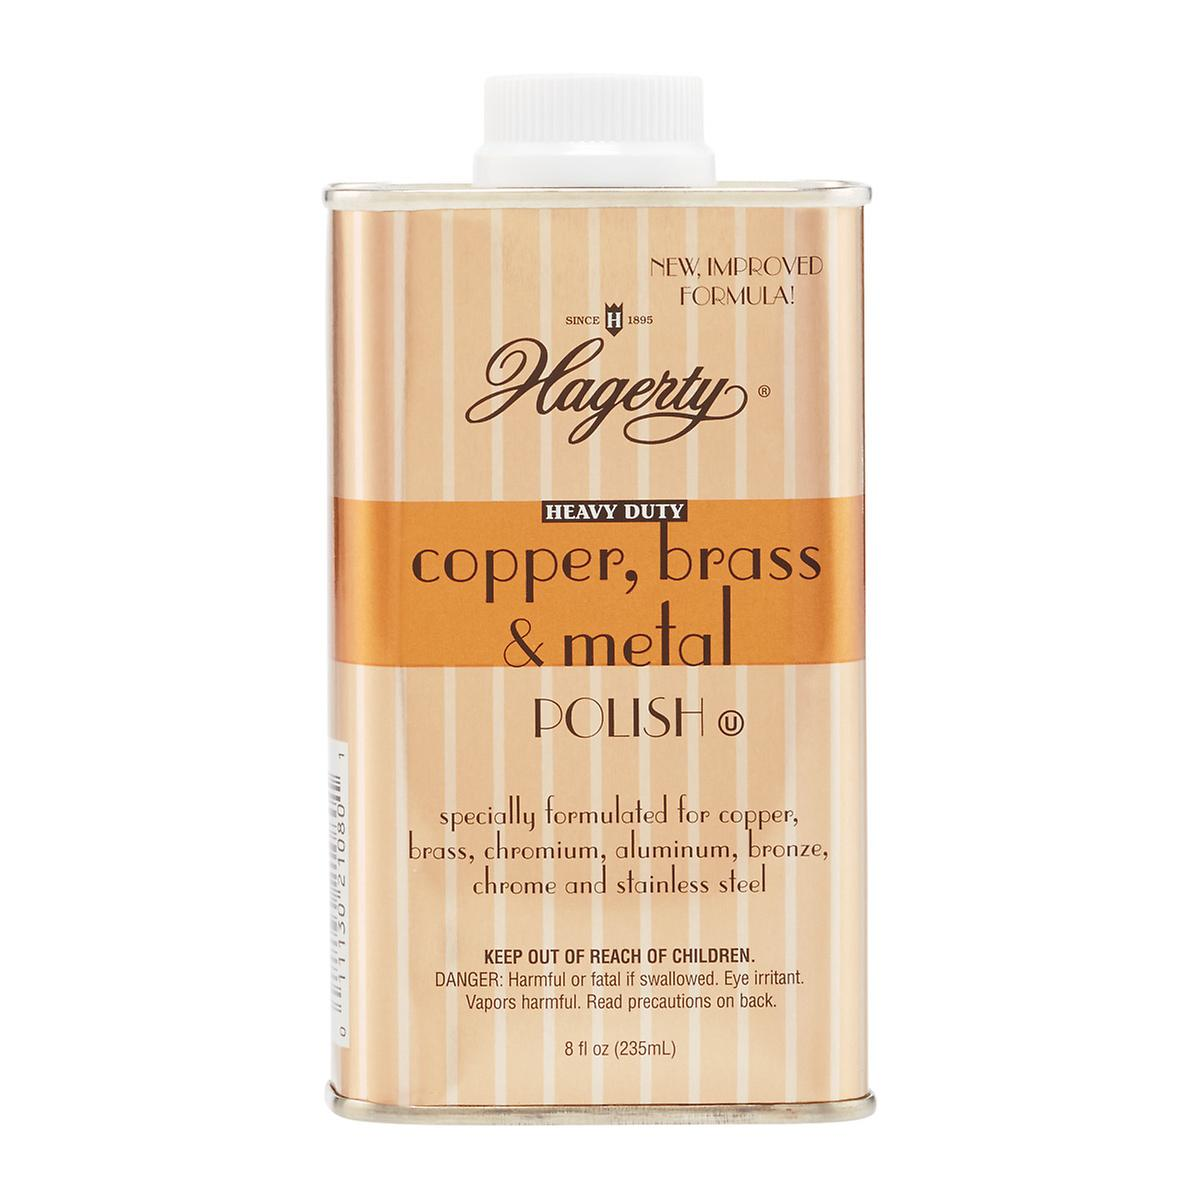 Hagerty 8 oz. Copper, Brass, & Metal Polish